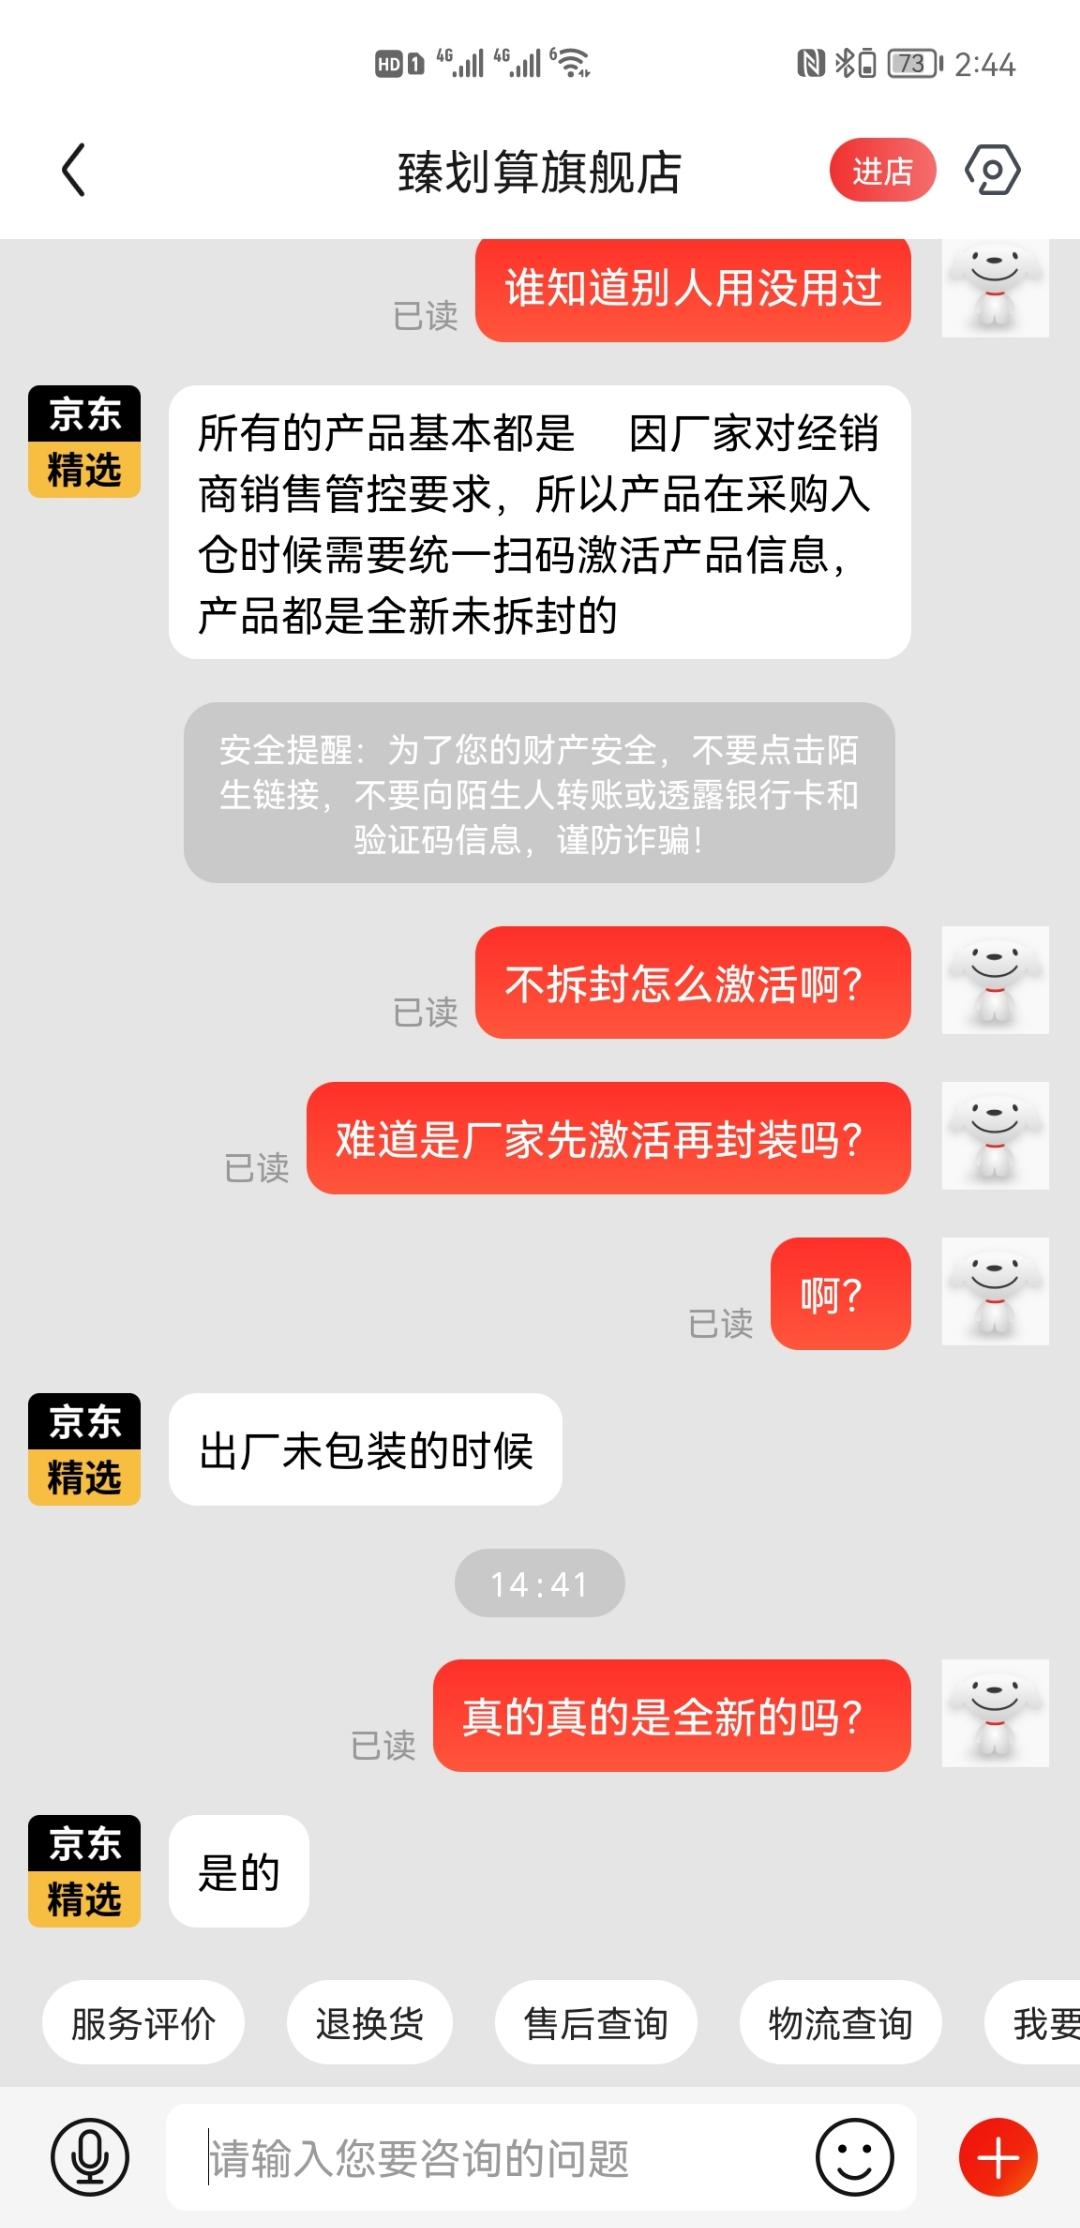 Screenshot_20210804_144426_com.jingdong.app.mall.jpg